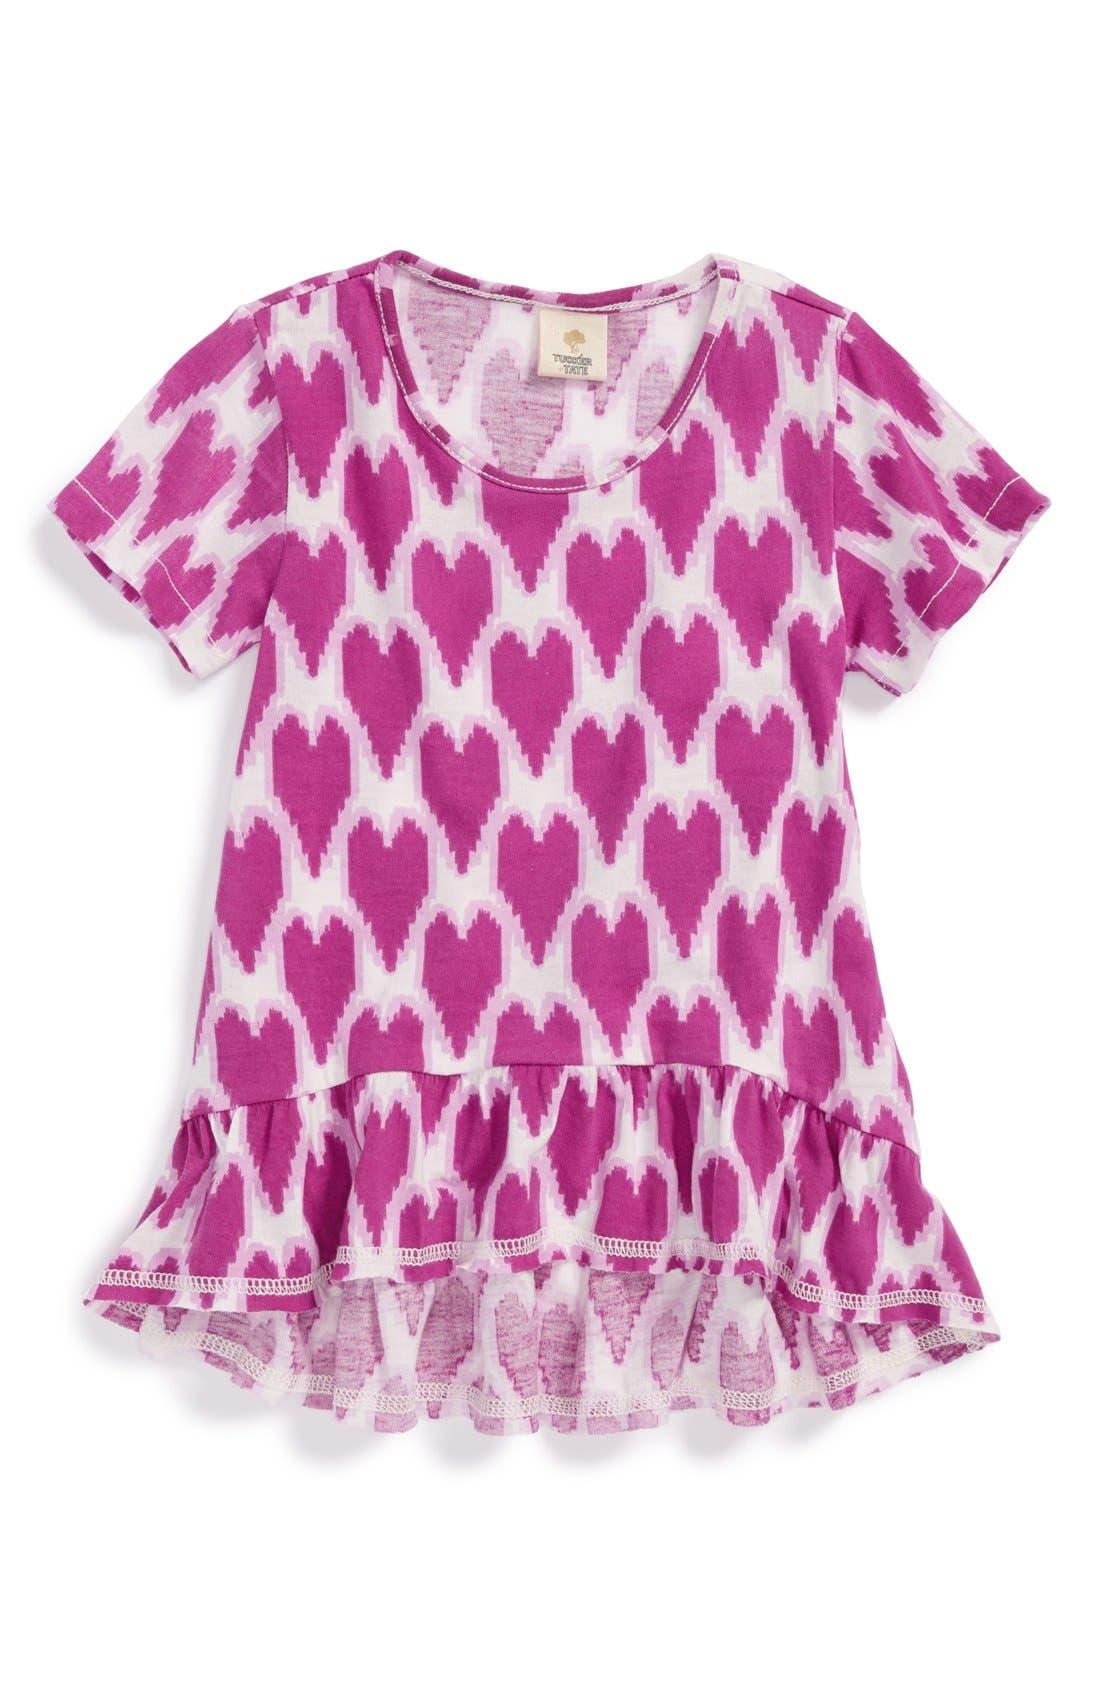 Alternate Image 1 Selected - Tucker + Tate 'Maiko' Print Top (Toddler Girls, Little Girls & Big Girls)